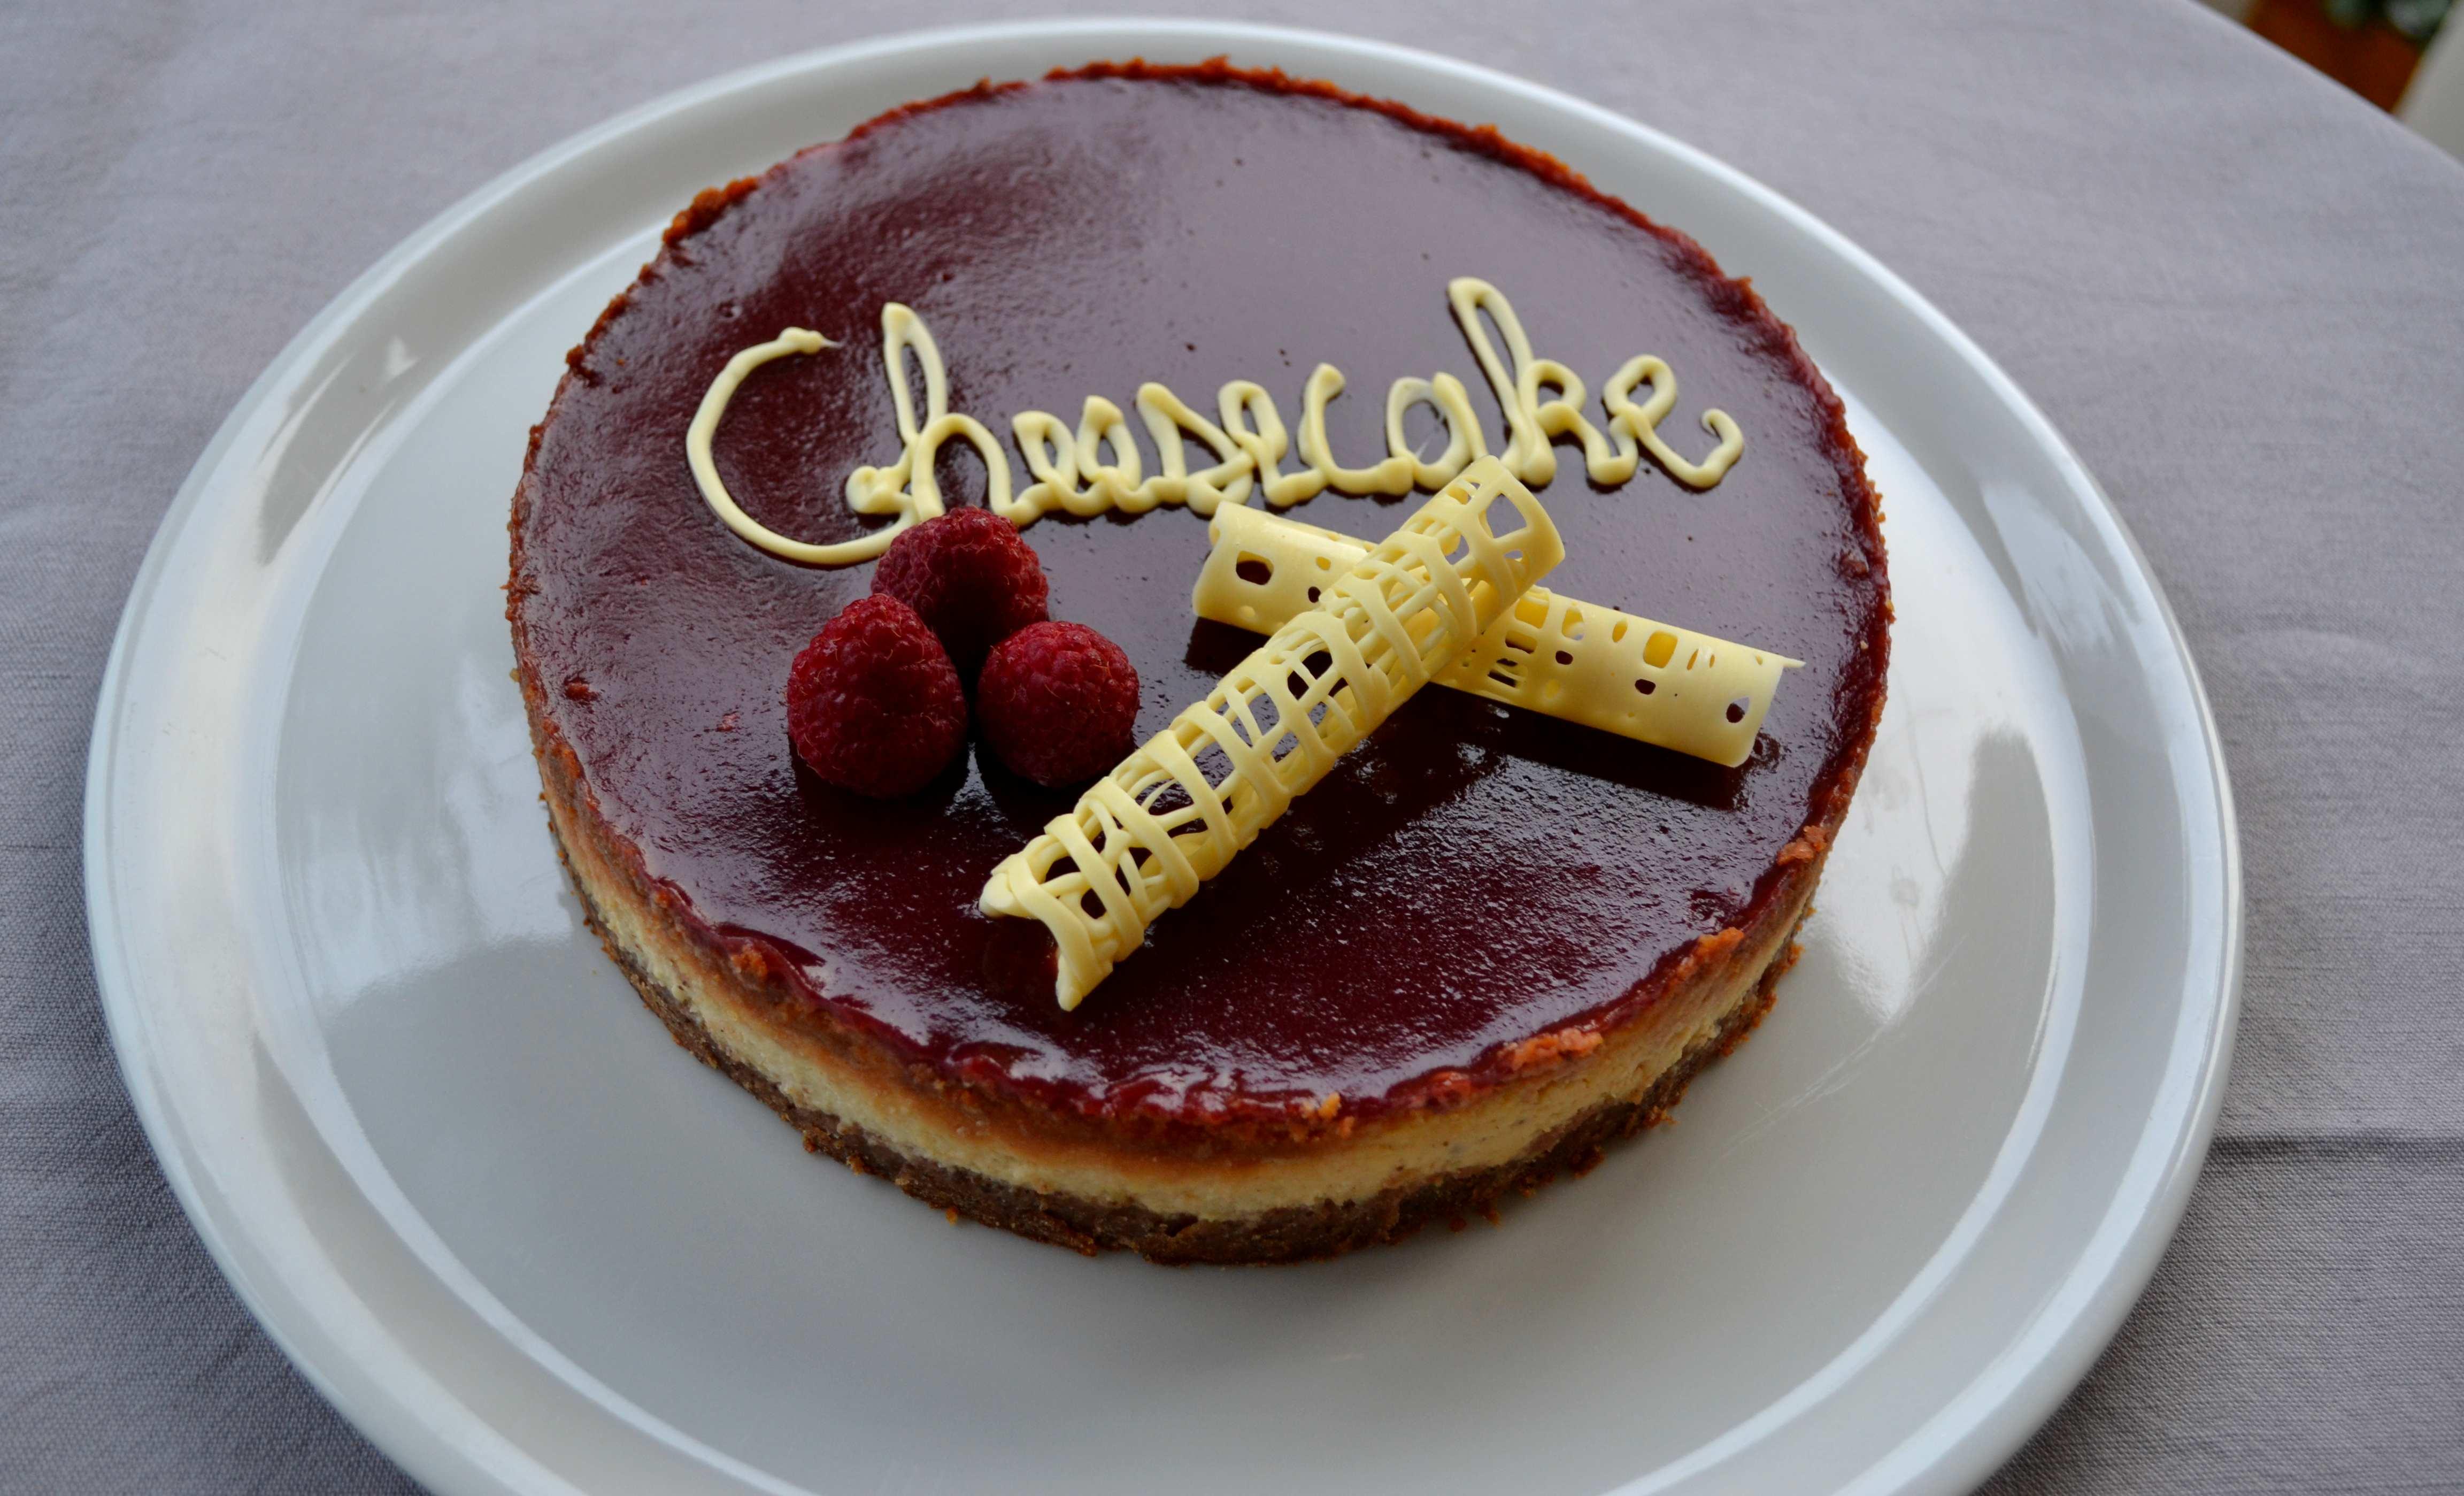 cheesecake au mascarpone sp culoos et framboise at d lices d 39 anne sophie. Black Bedroom Furniture Sets. Home Design Ideas